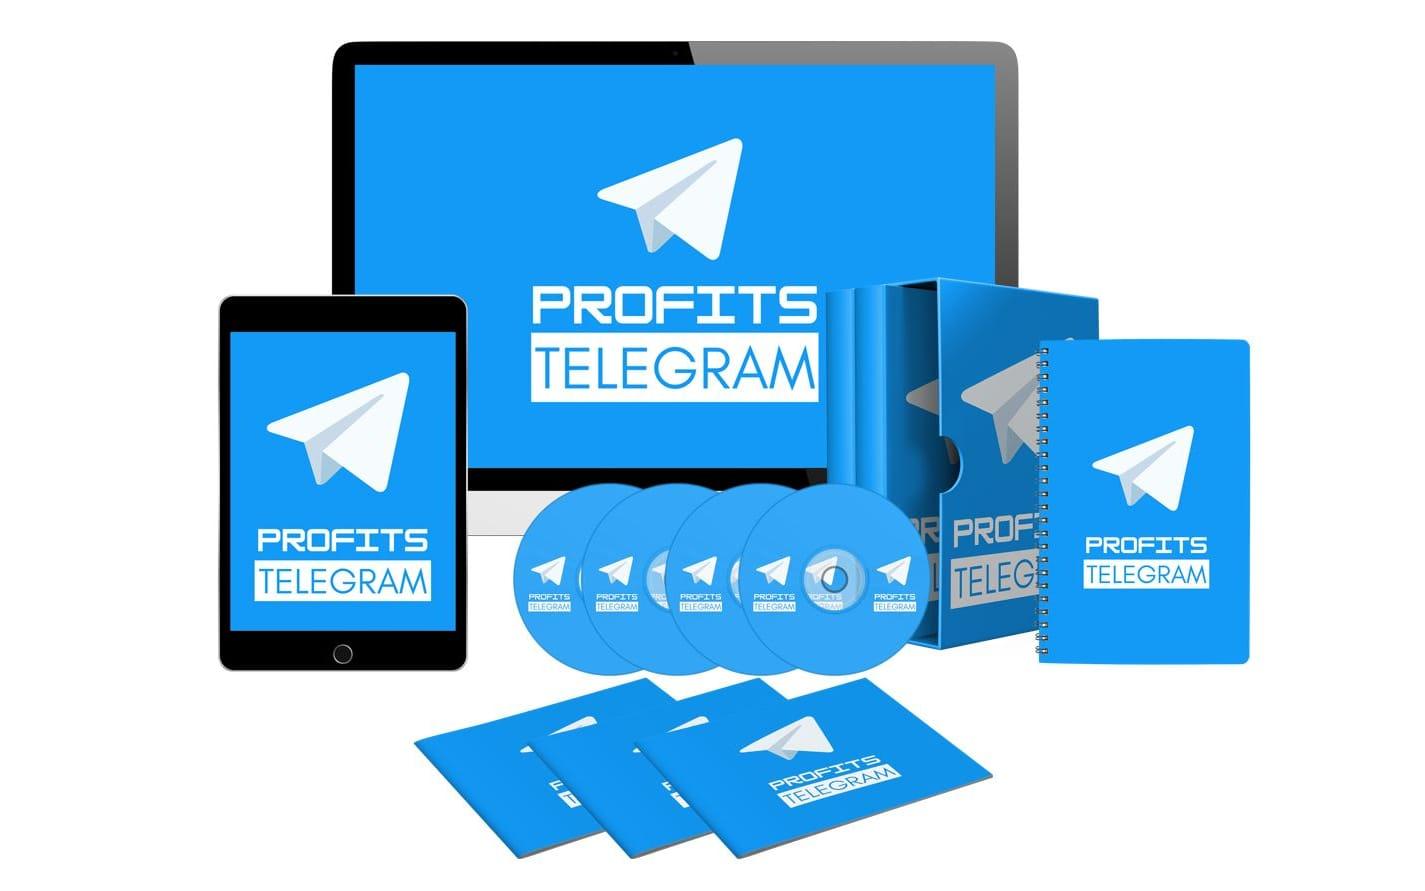 🐋 Profits Telegram (45K € de ventes) : Offre Make Money Incontournable 🐋